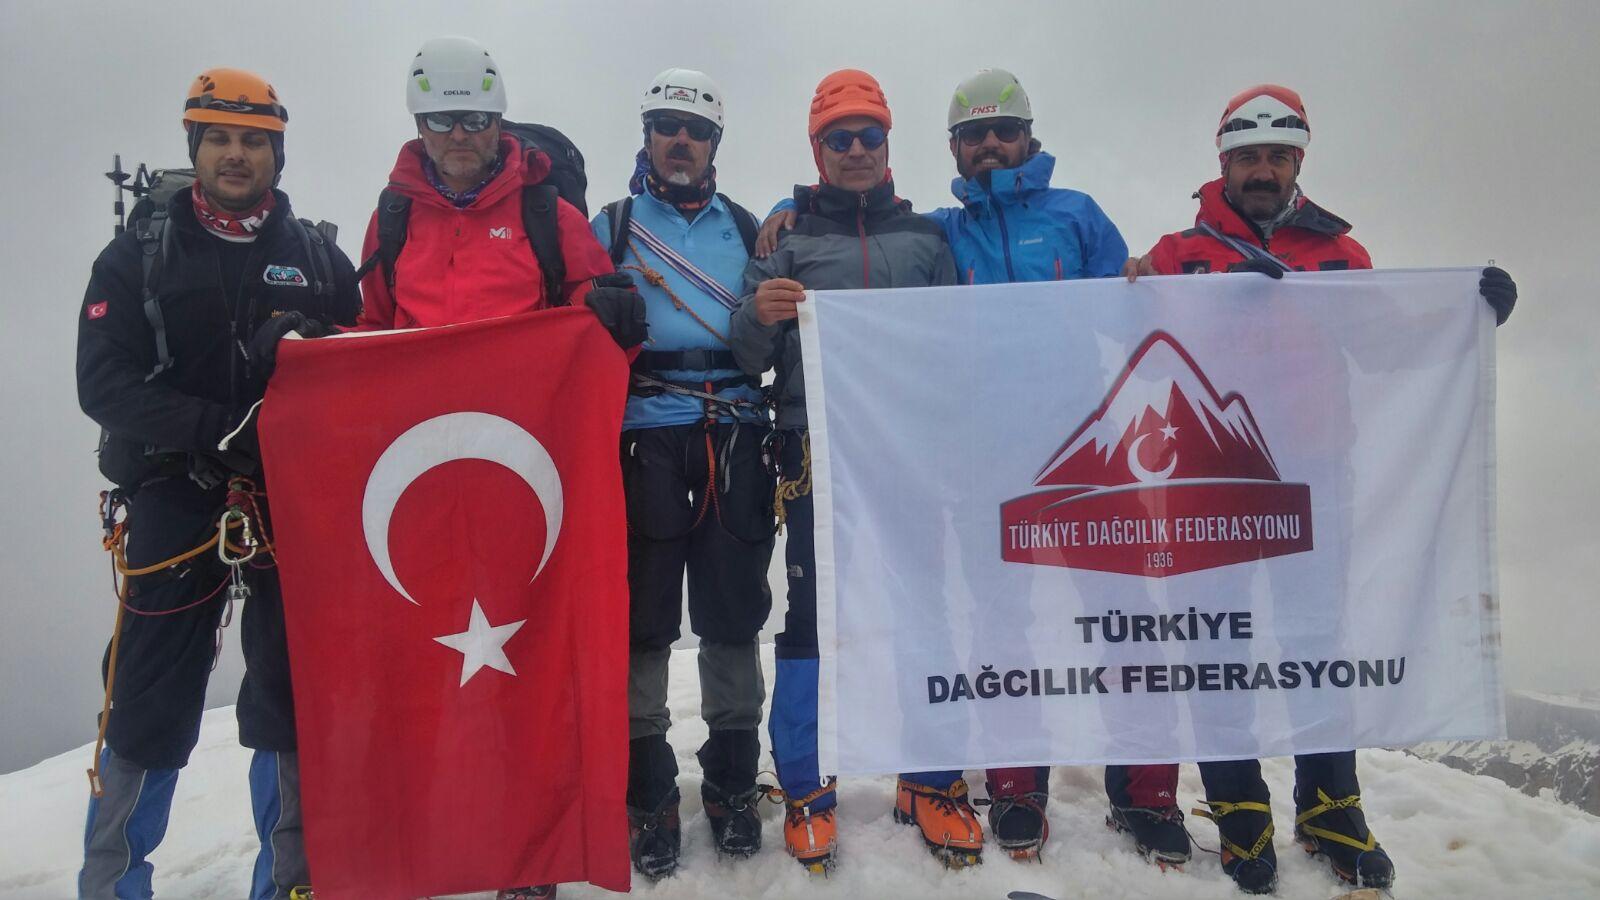 Yüksek İrtifa Aday Kadro Doğal Ortam Tırmanışları tamamlandı.